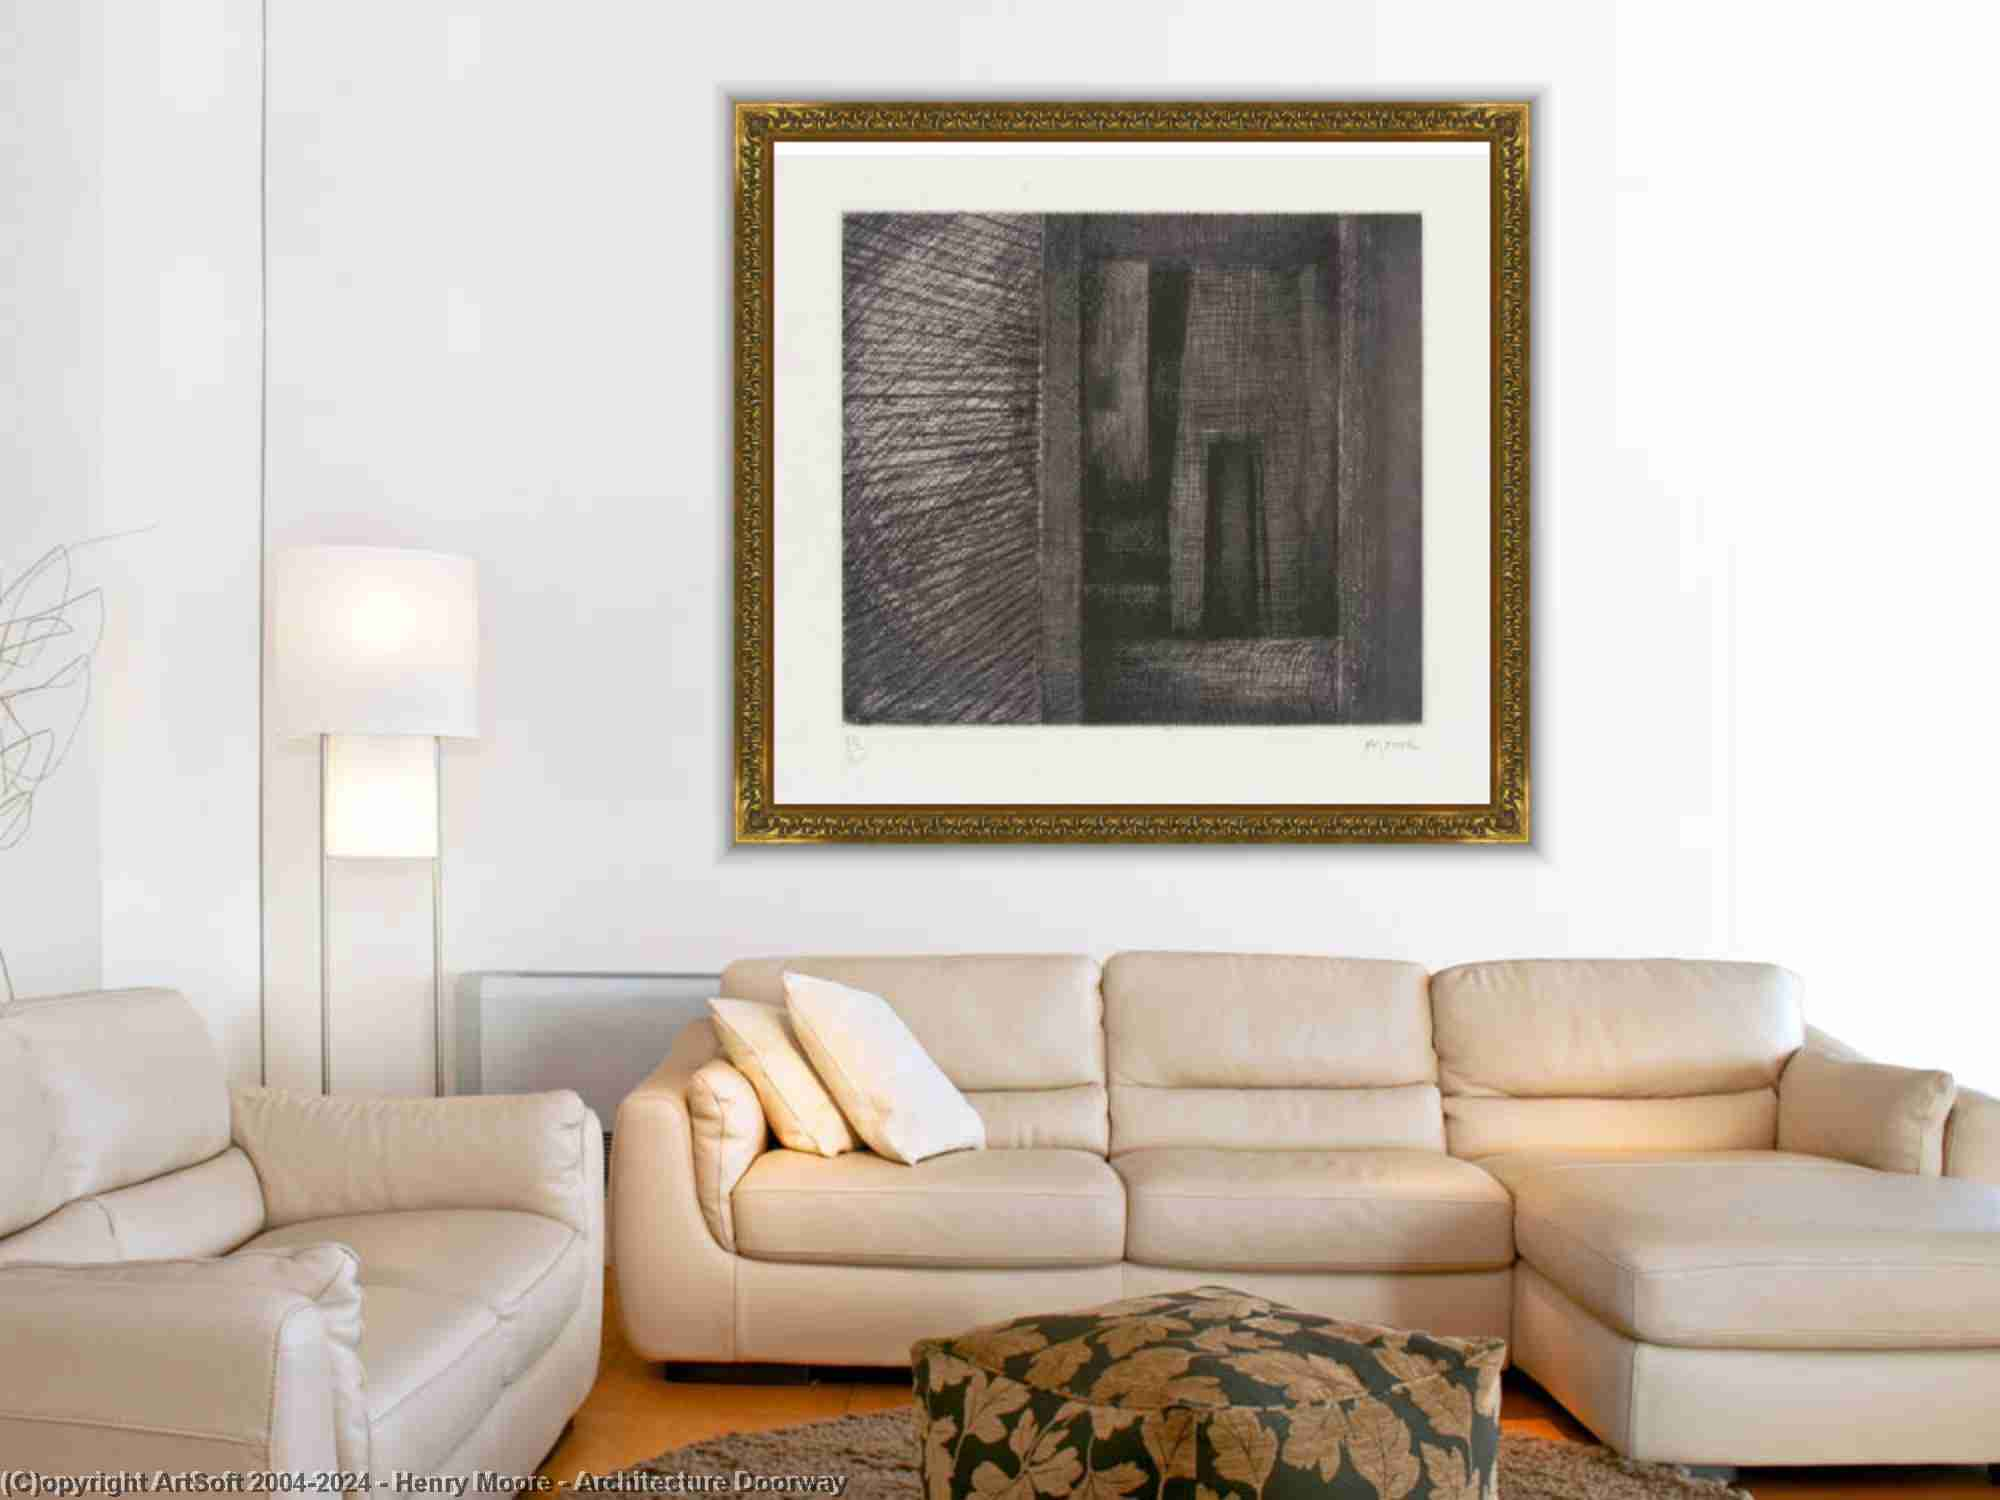 Henry Moore - Архитектура Дверной проем